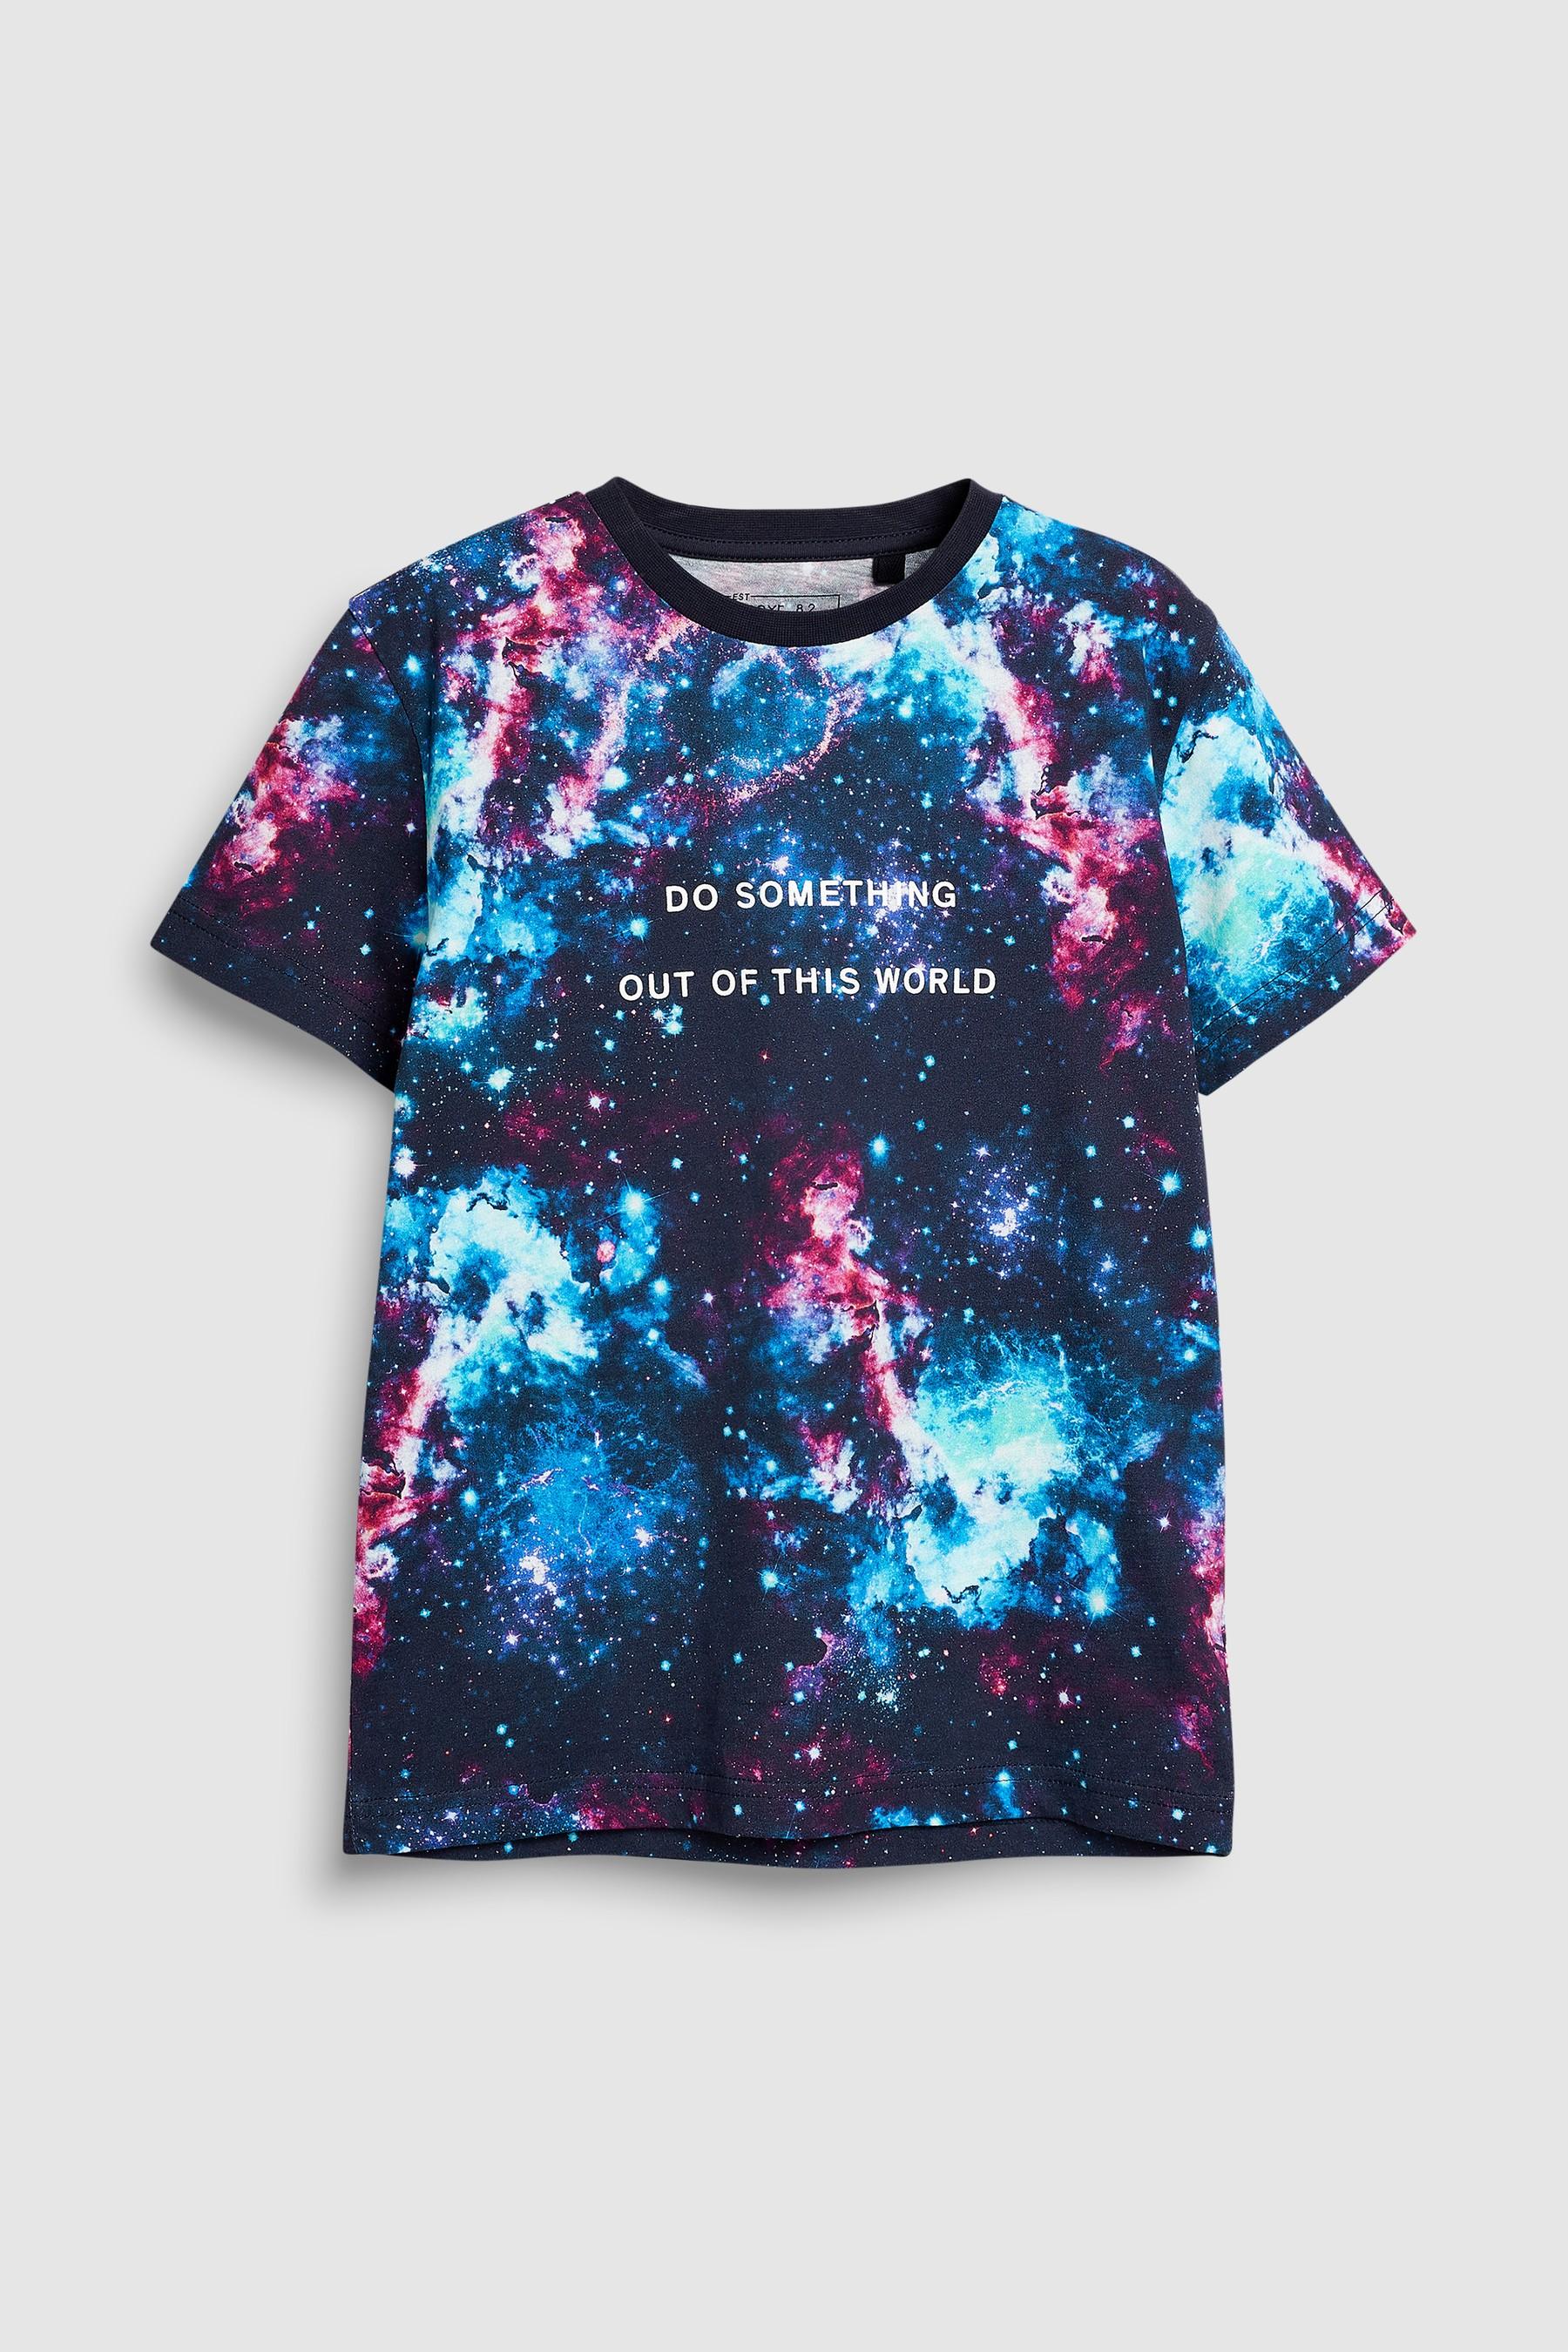 7e888db6 Boys Next Multi All-Over Print Slogan T-Shirt (3-16yrs) - Blue ...